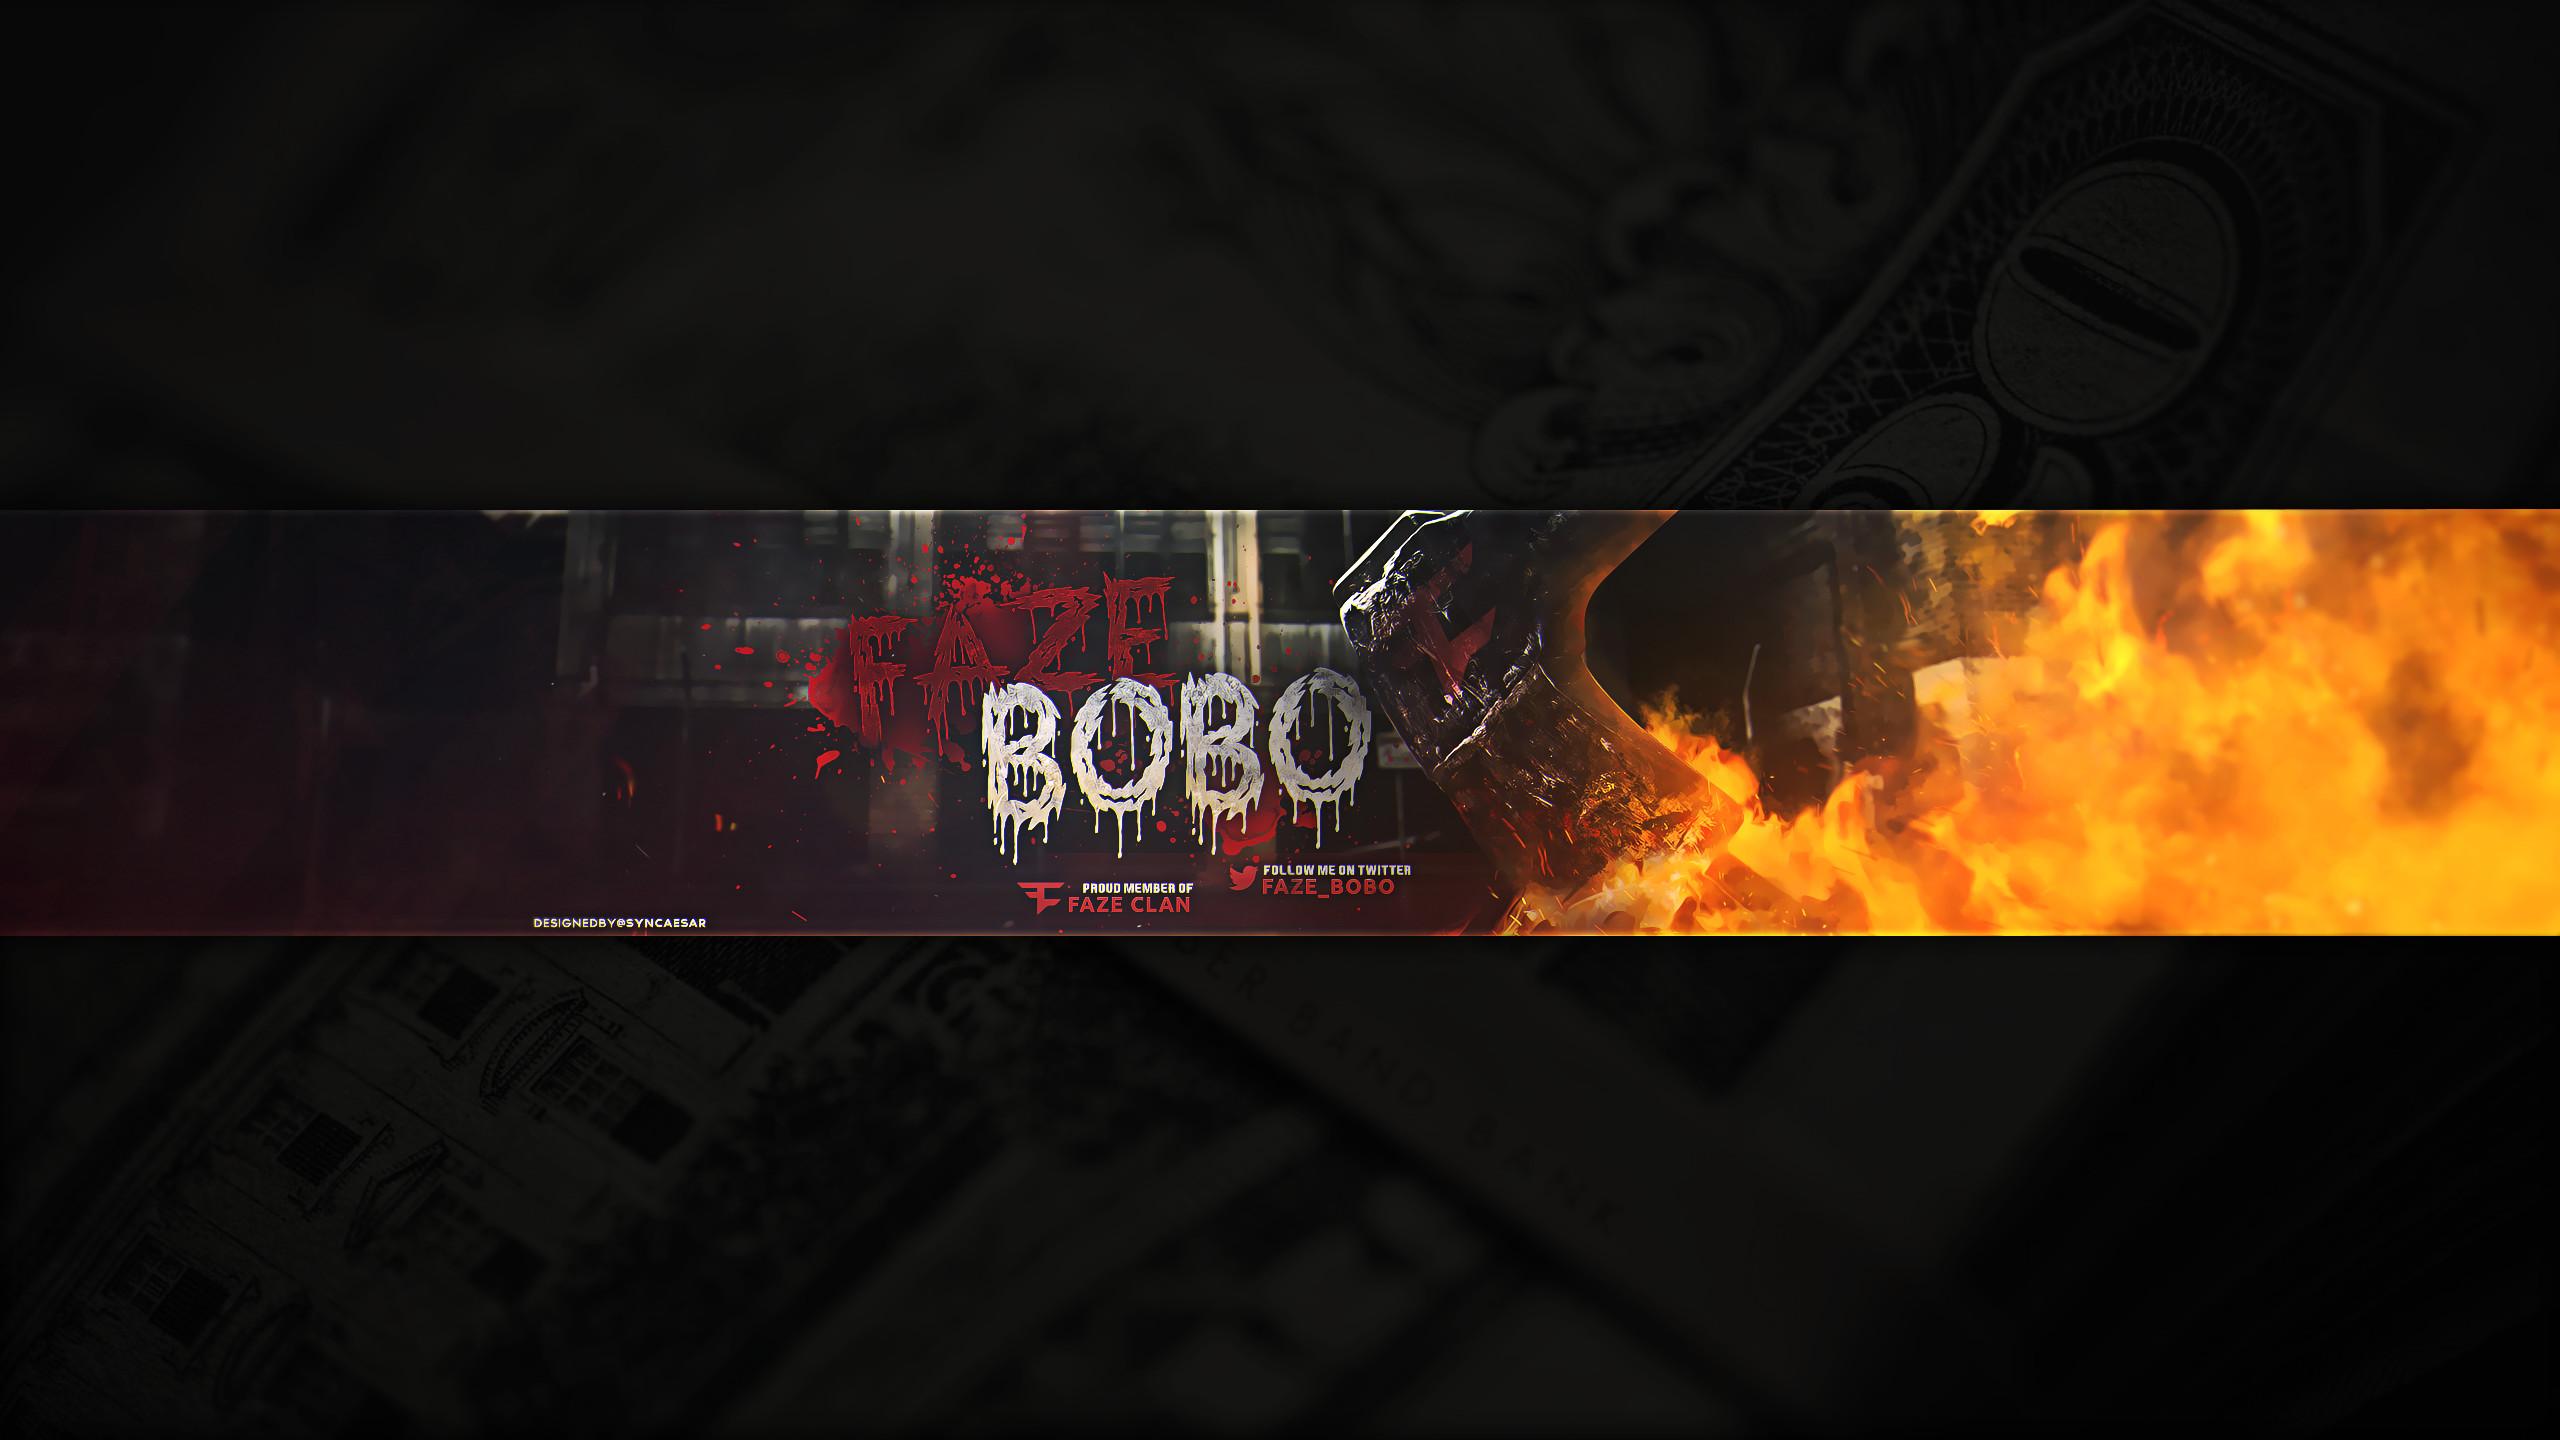 … Bobo of Faze clan by BeingCaesar